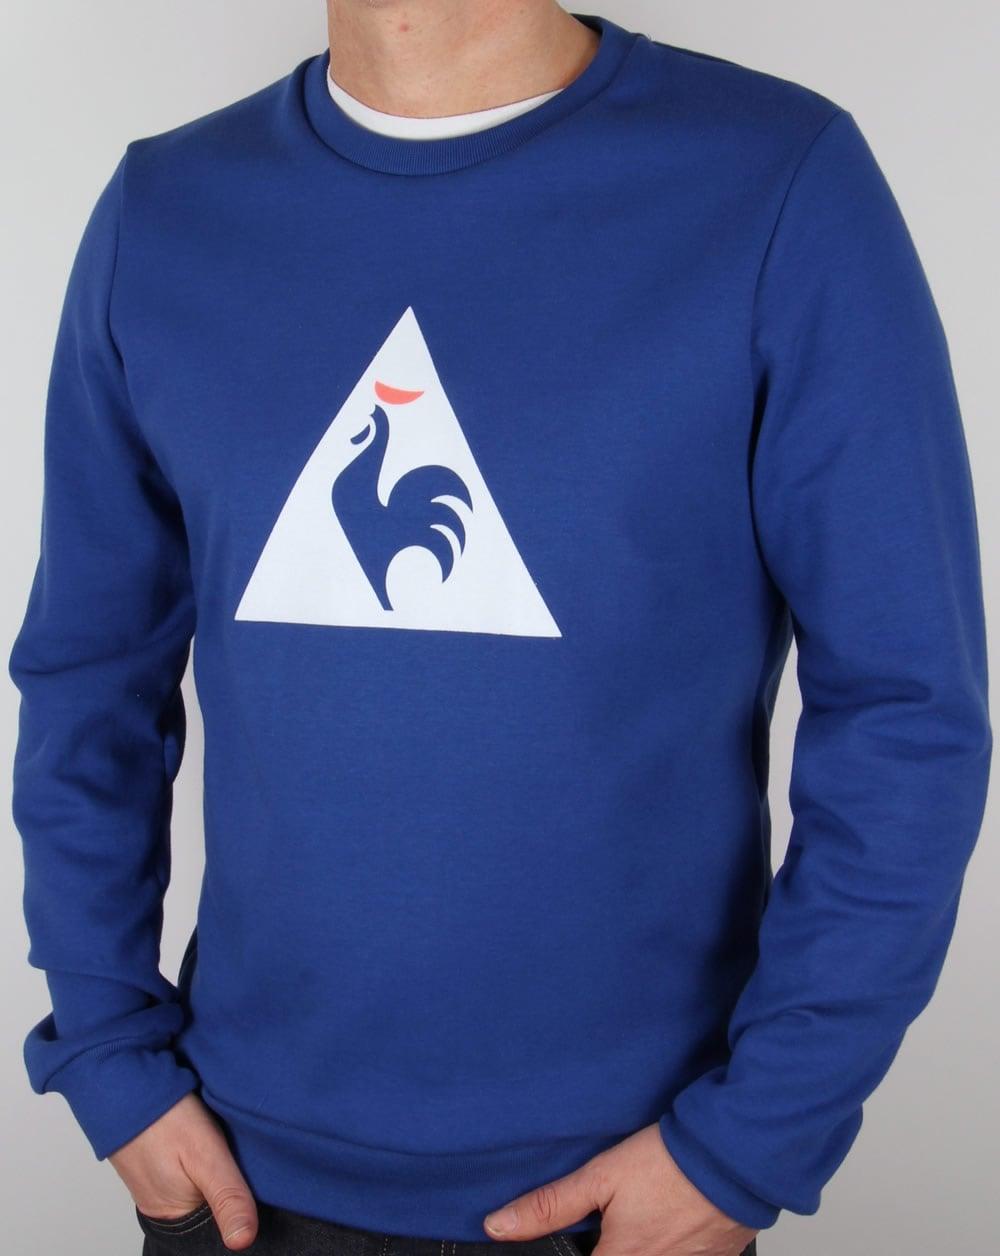 le coq sportif coq logo sweatshirt royal blue jumper sweater knit mens. Black Bedroom Furniture Sets. Home Design Ideas